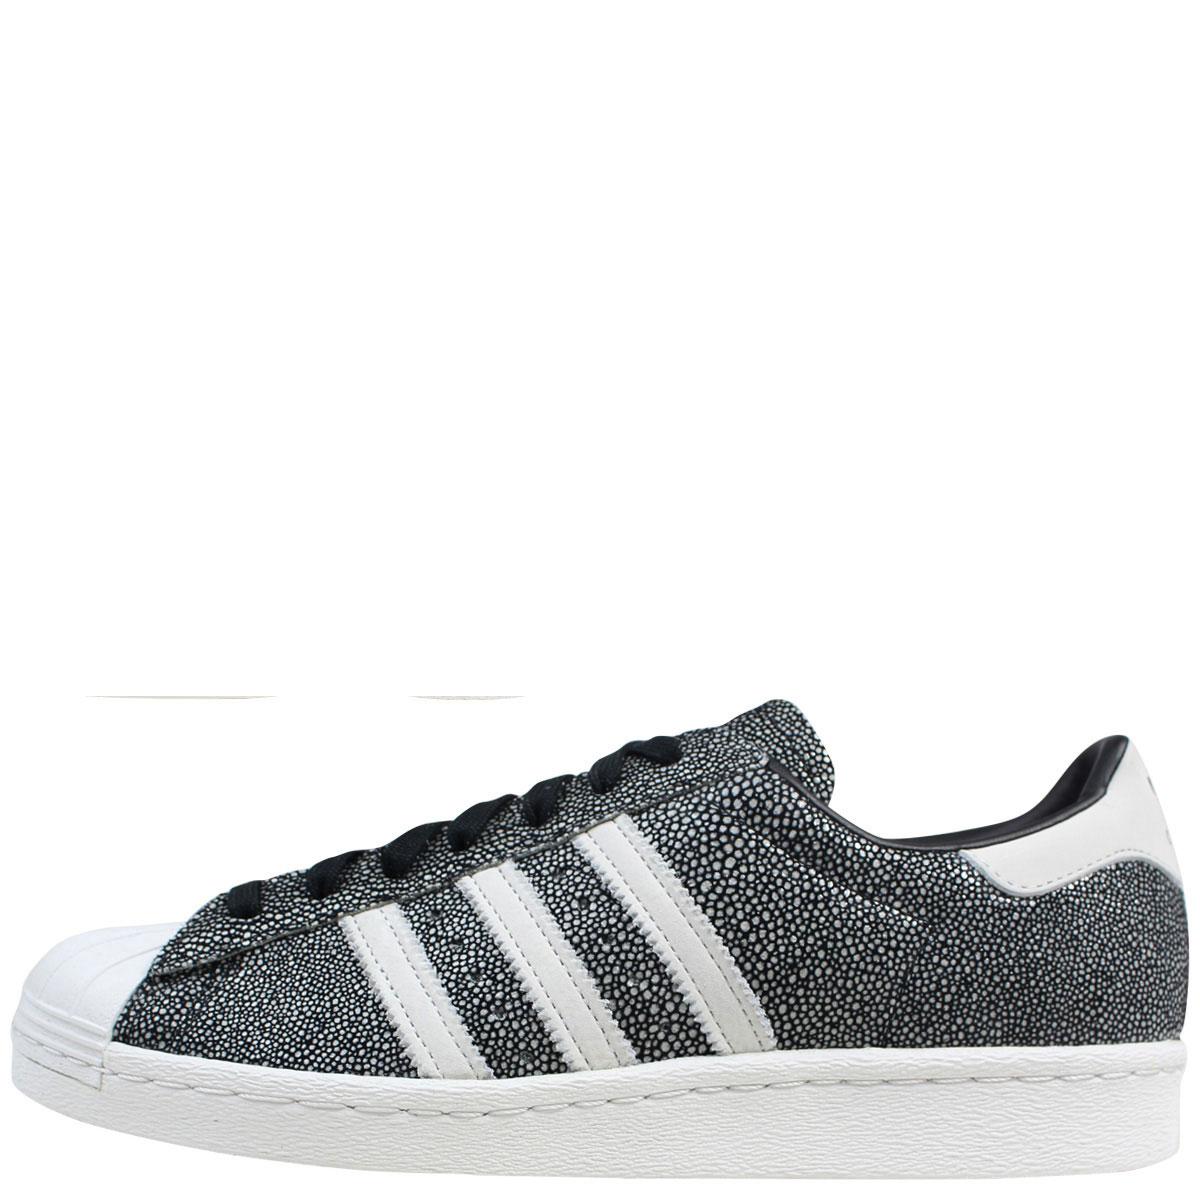 86d595ac ALLSPORTS: adidas Originals adidas originals superstar sneakers ...